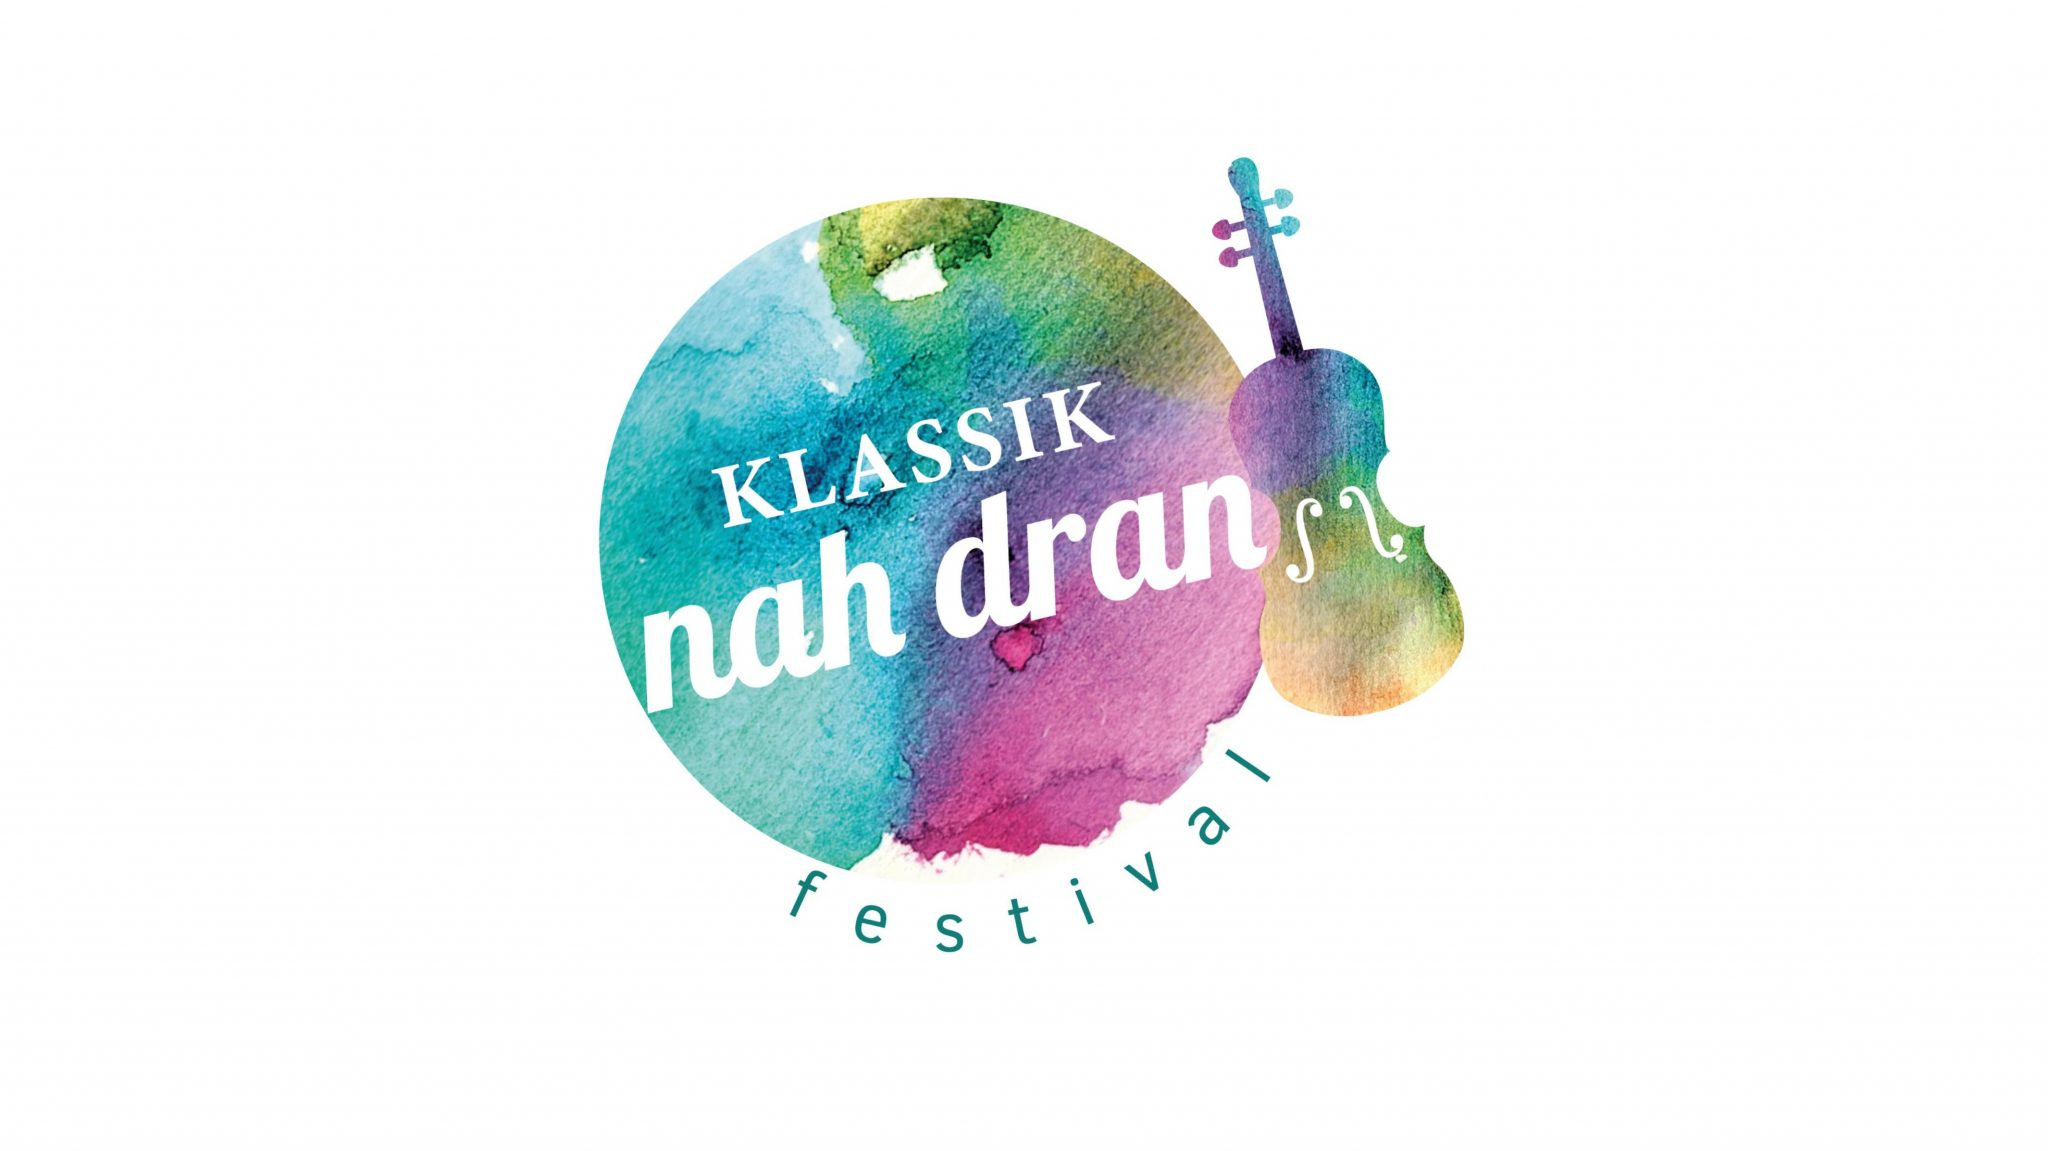 Klassik Nah Dran - A close up of food - Logo